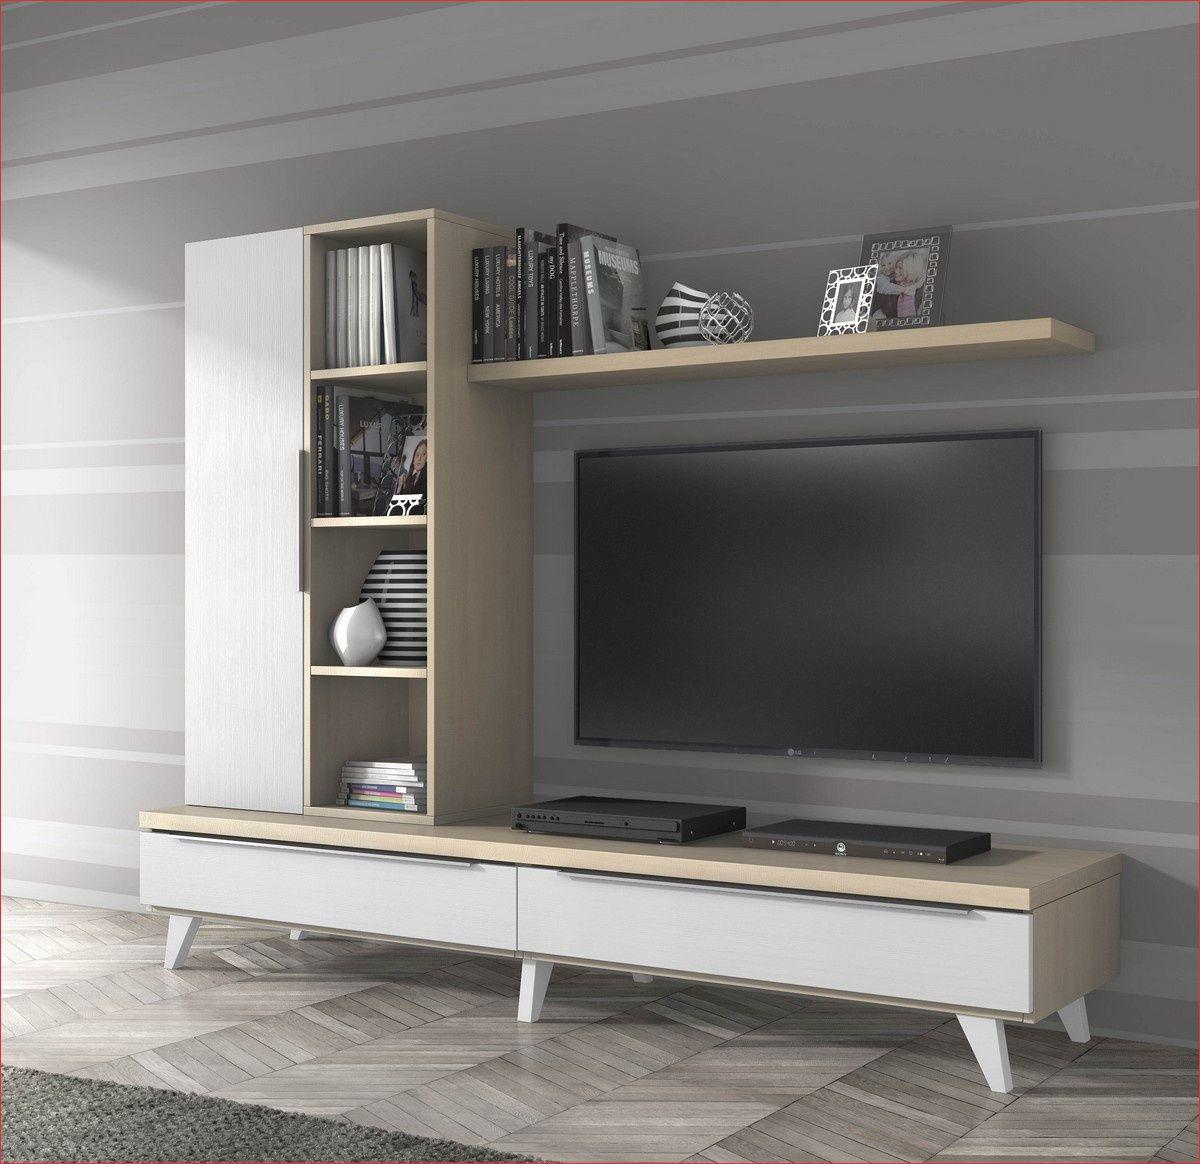 11 Utile Composition Meuble Tv Collection In 2020 Interior Furniture Furniture Interior